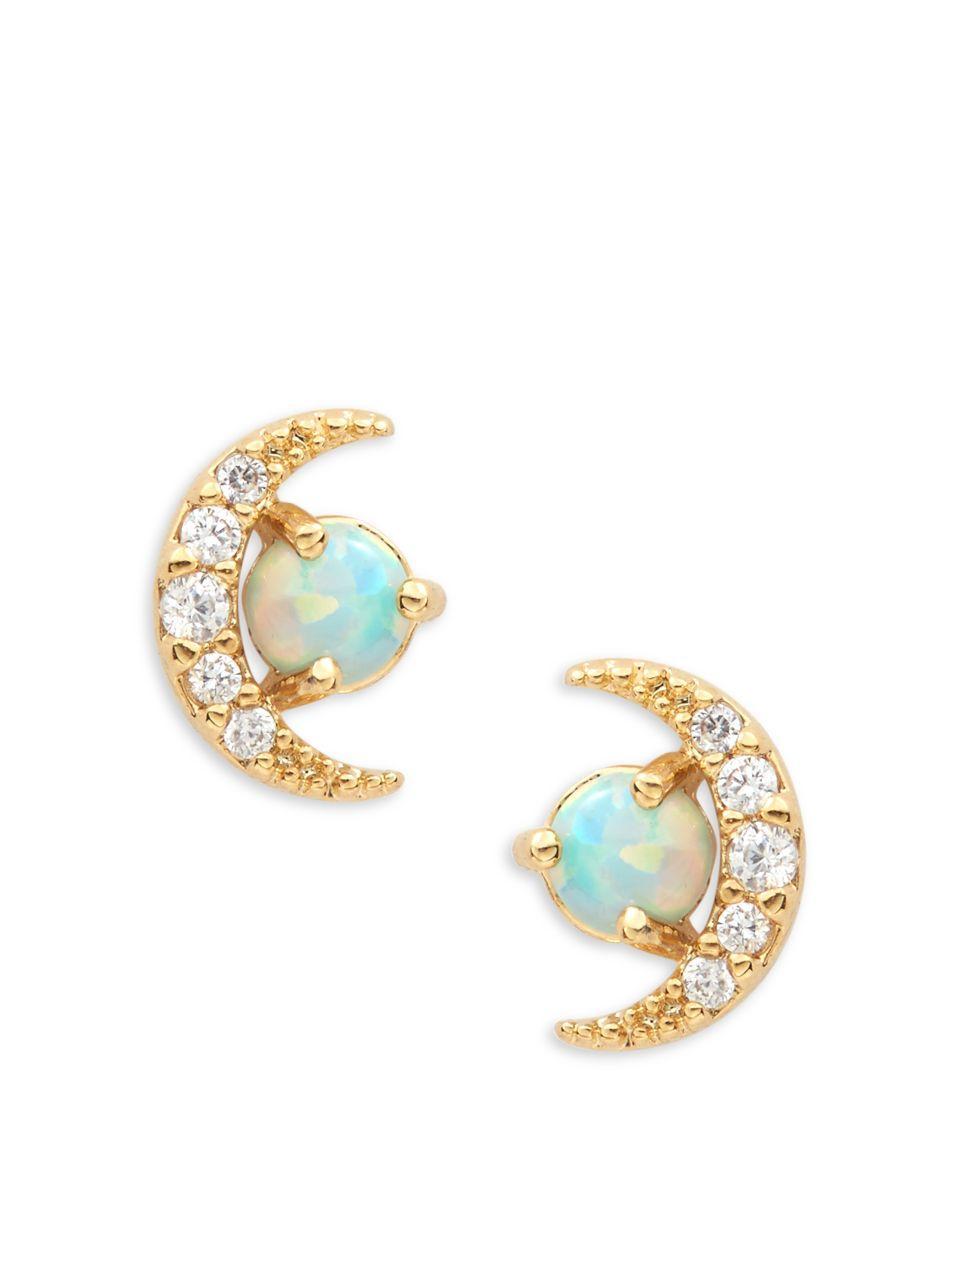 Tai Jewelry Rectangular opal CZ Stud Aqua enAJtL6DyL